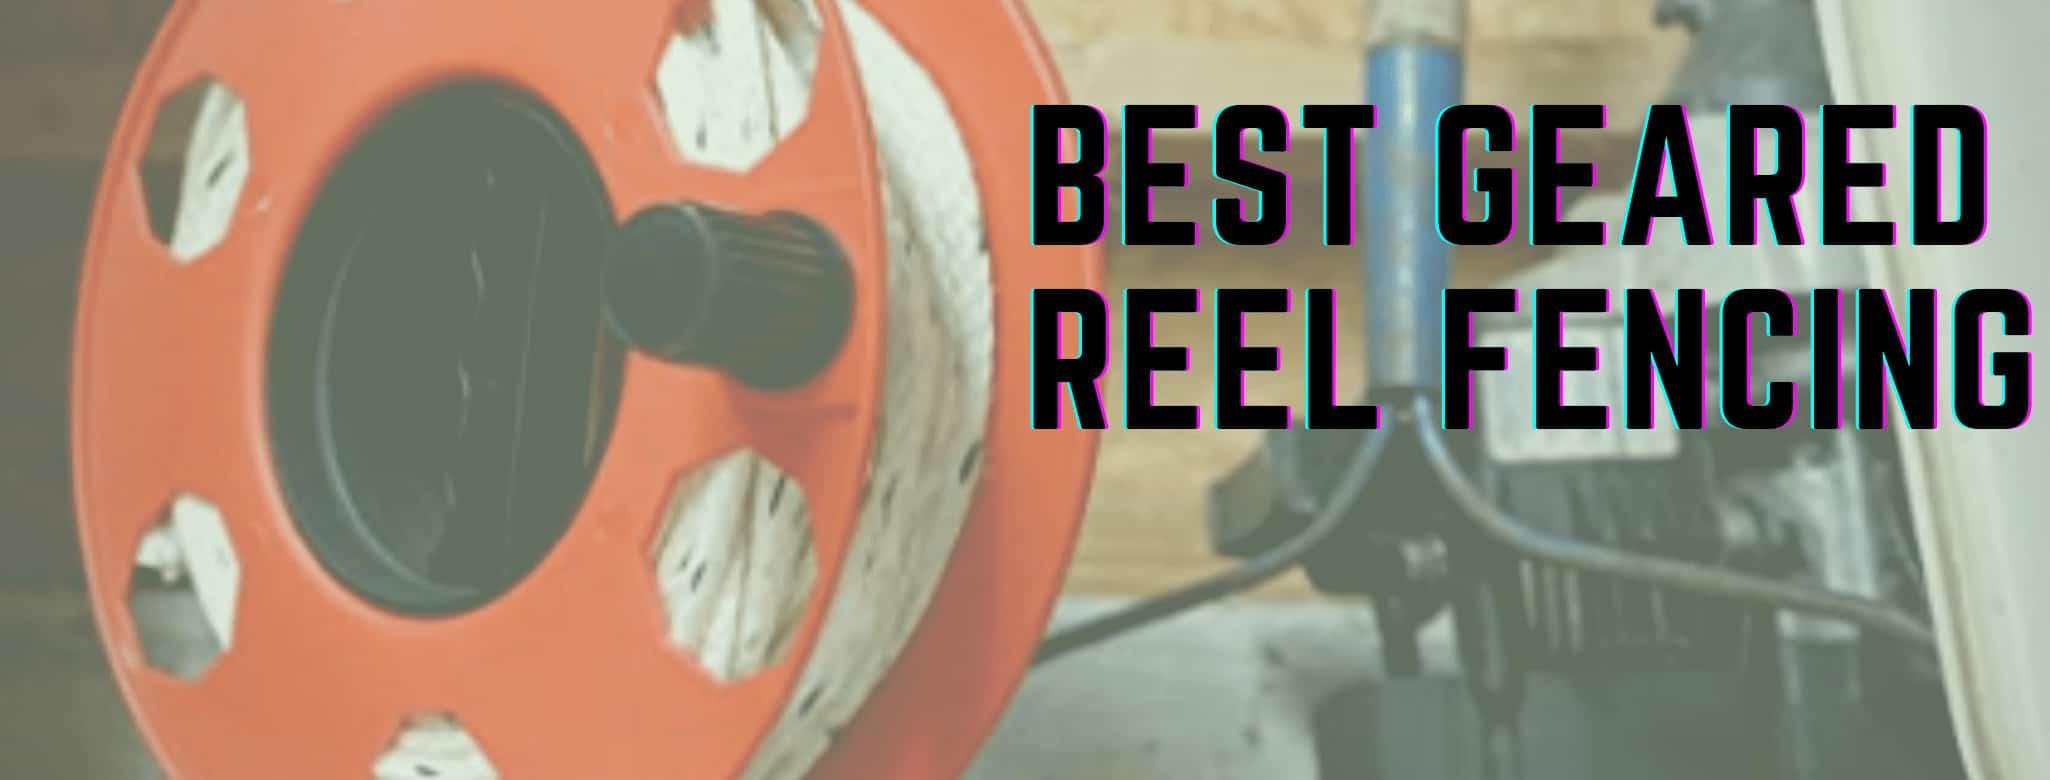 best Geared reel fencing